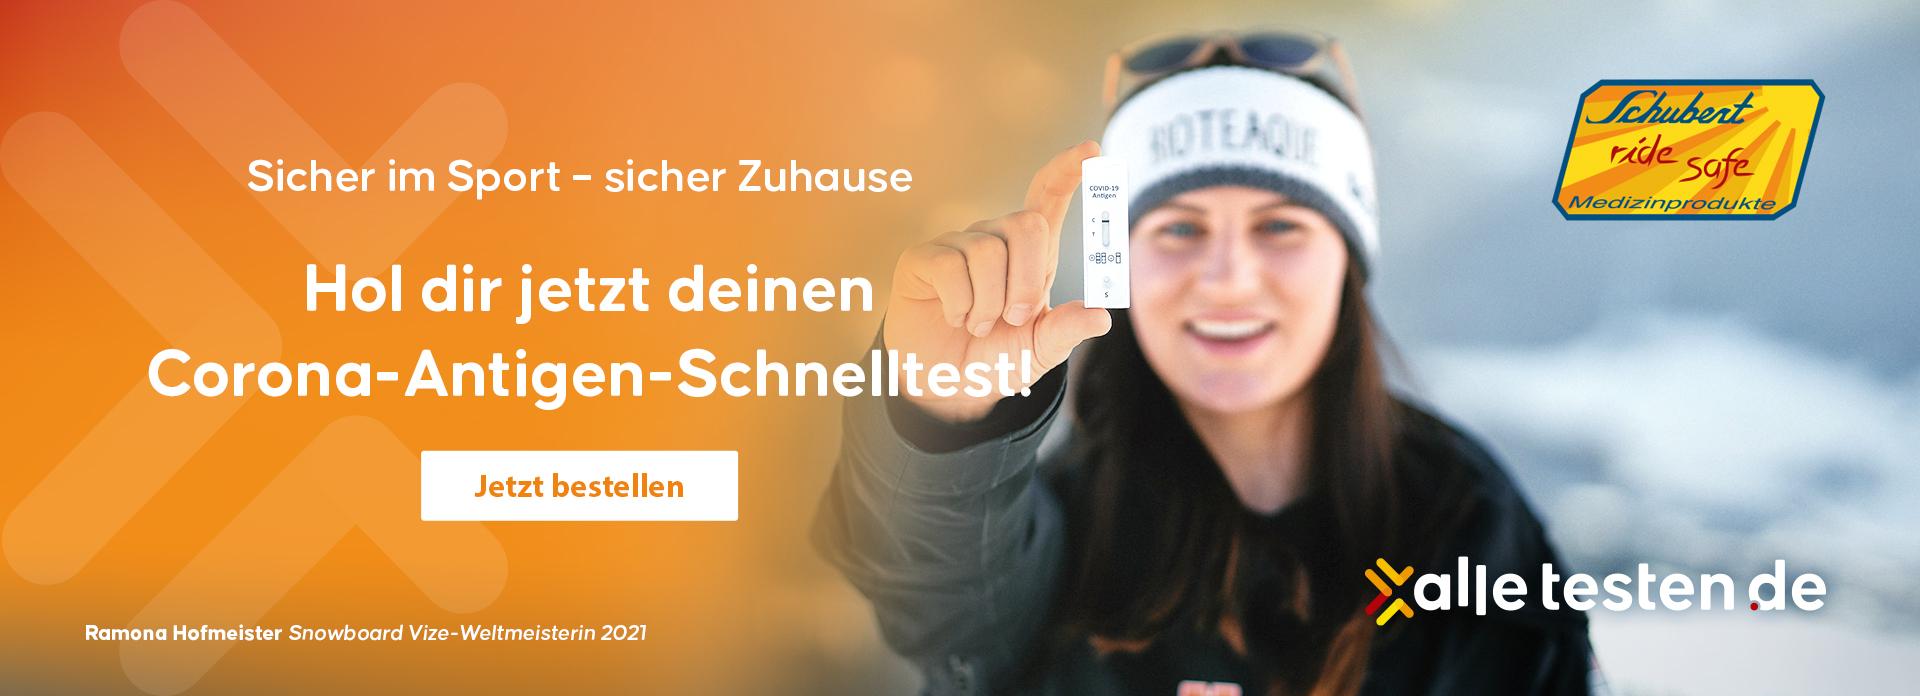 Corona Selbsttest kaufen bei alletesten.de